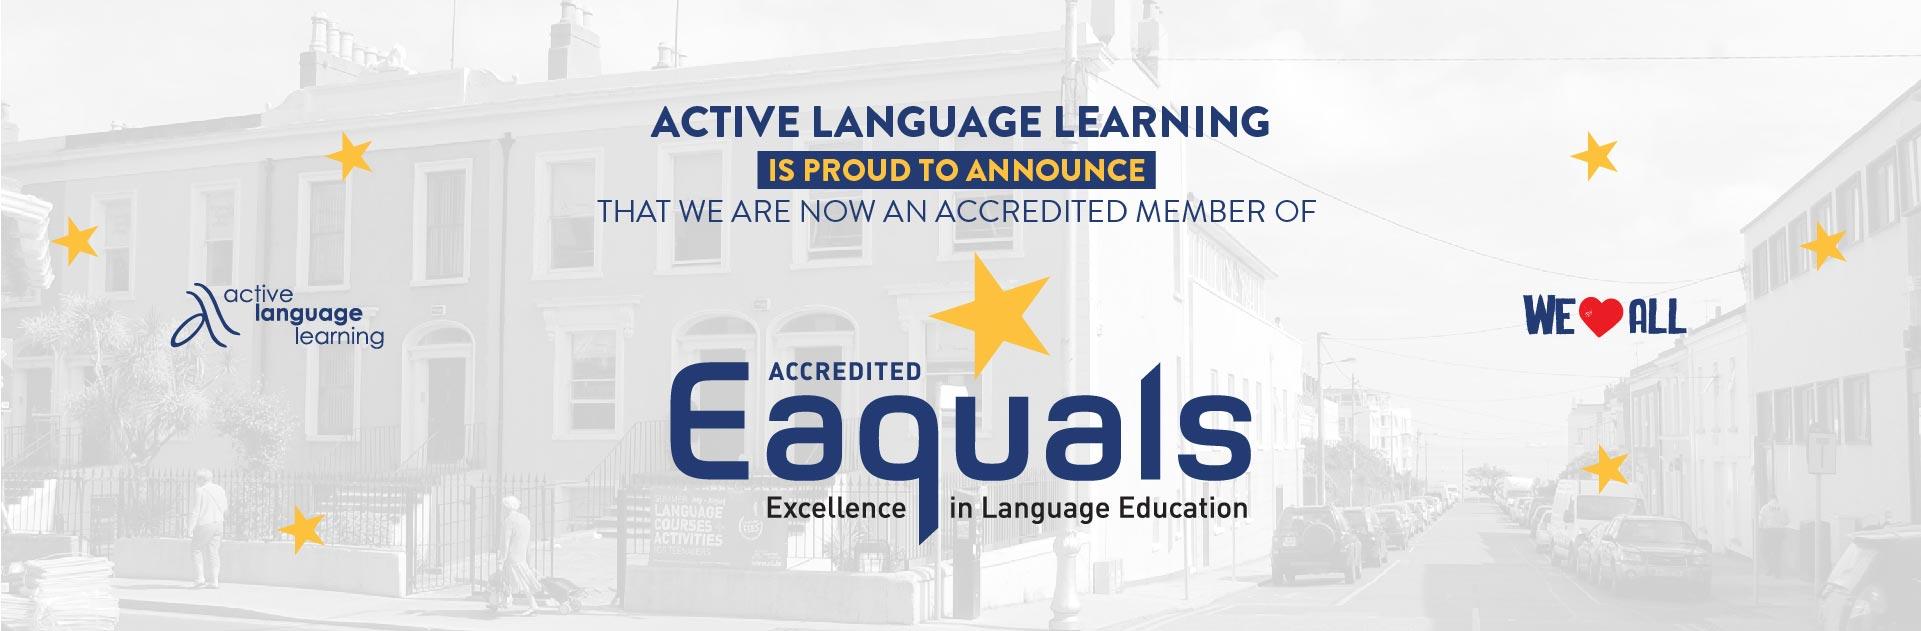 Exzellenz in der Sprachpädagogik